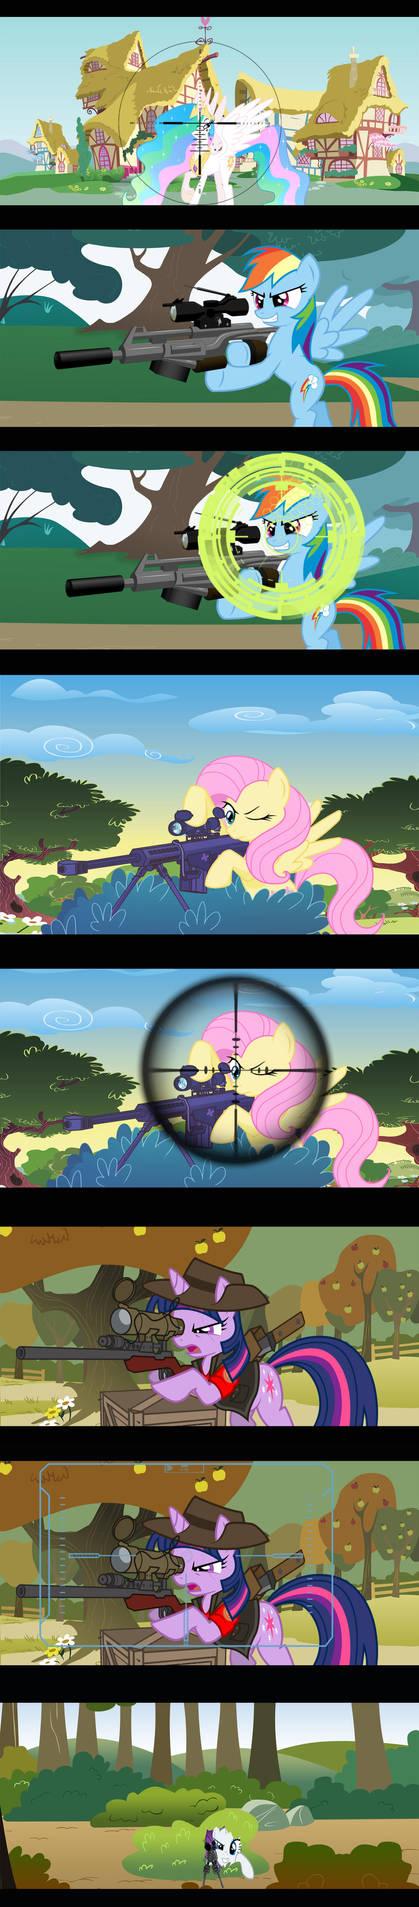 Shooter on the Pony Knoll by Vorstriem